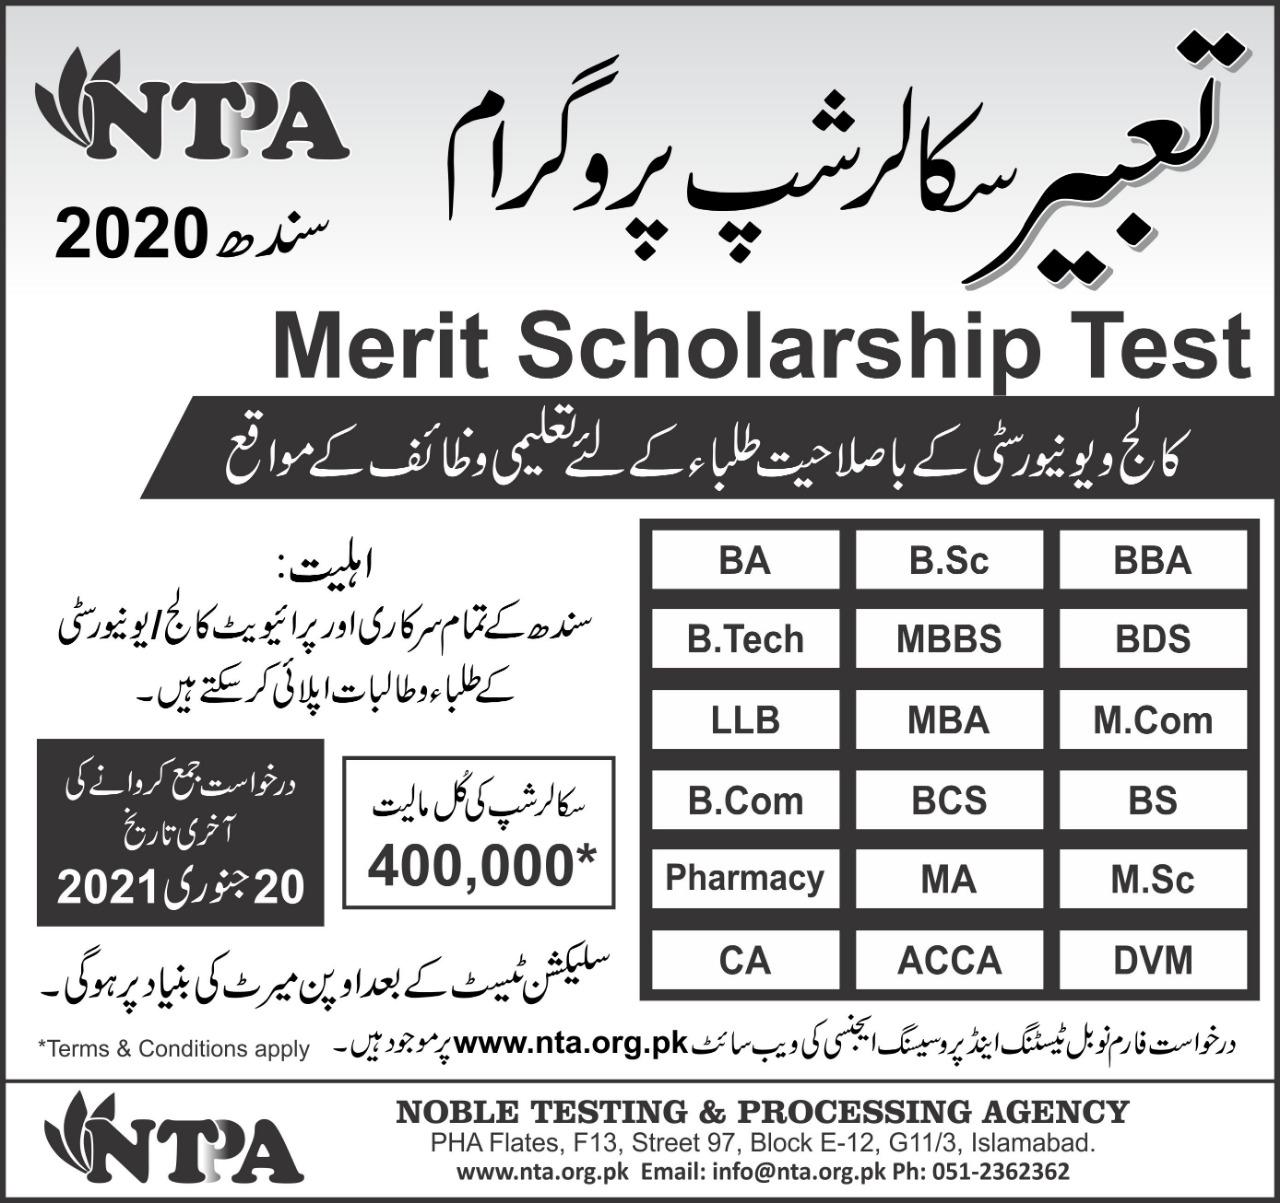 NTPA Tabeer Scholarship Program Sindh 2021 Application Form Roll No Slip Test Schedule Download Online